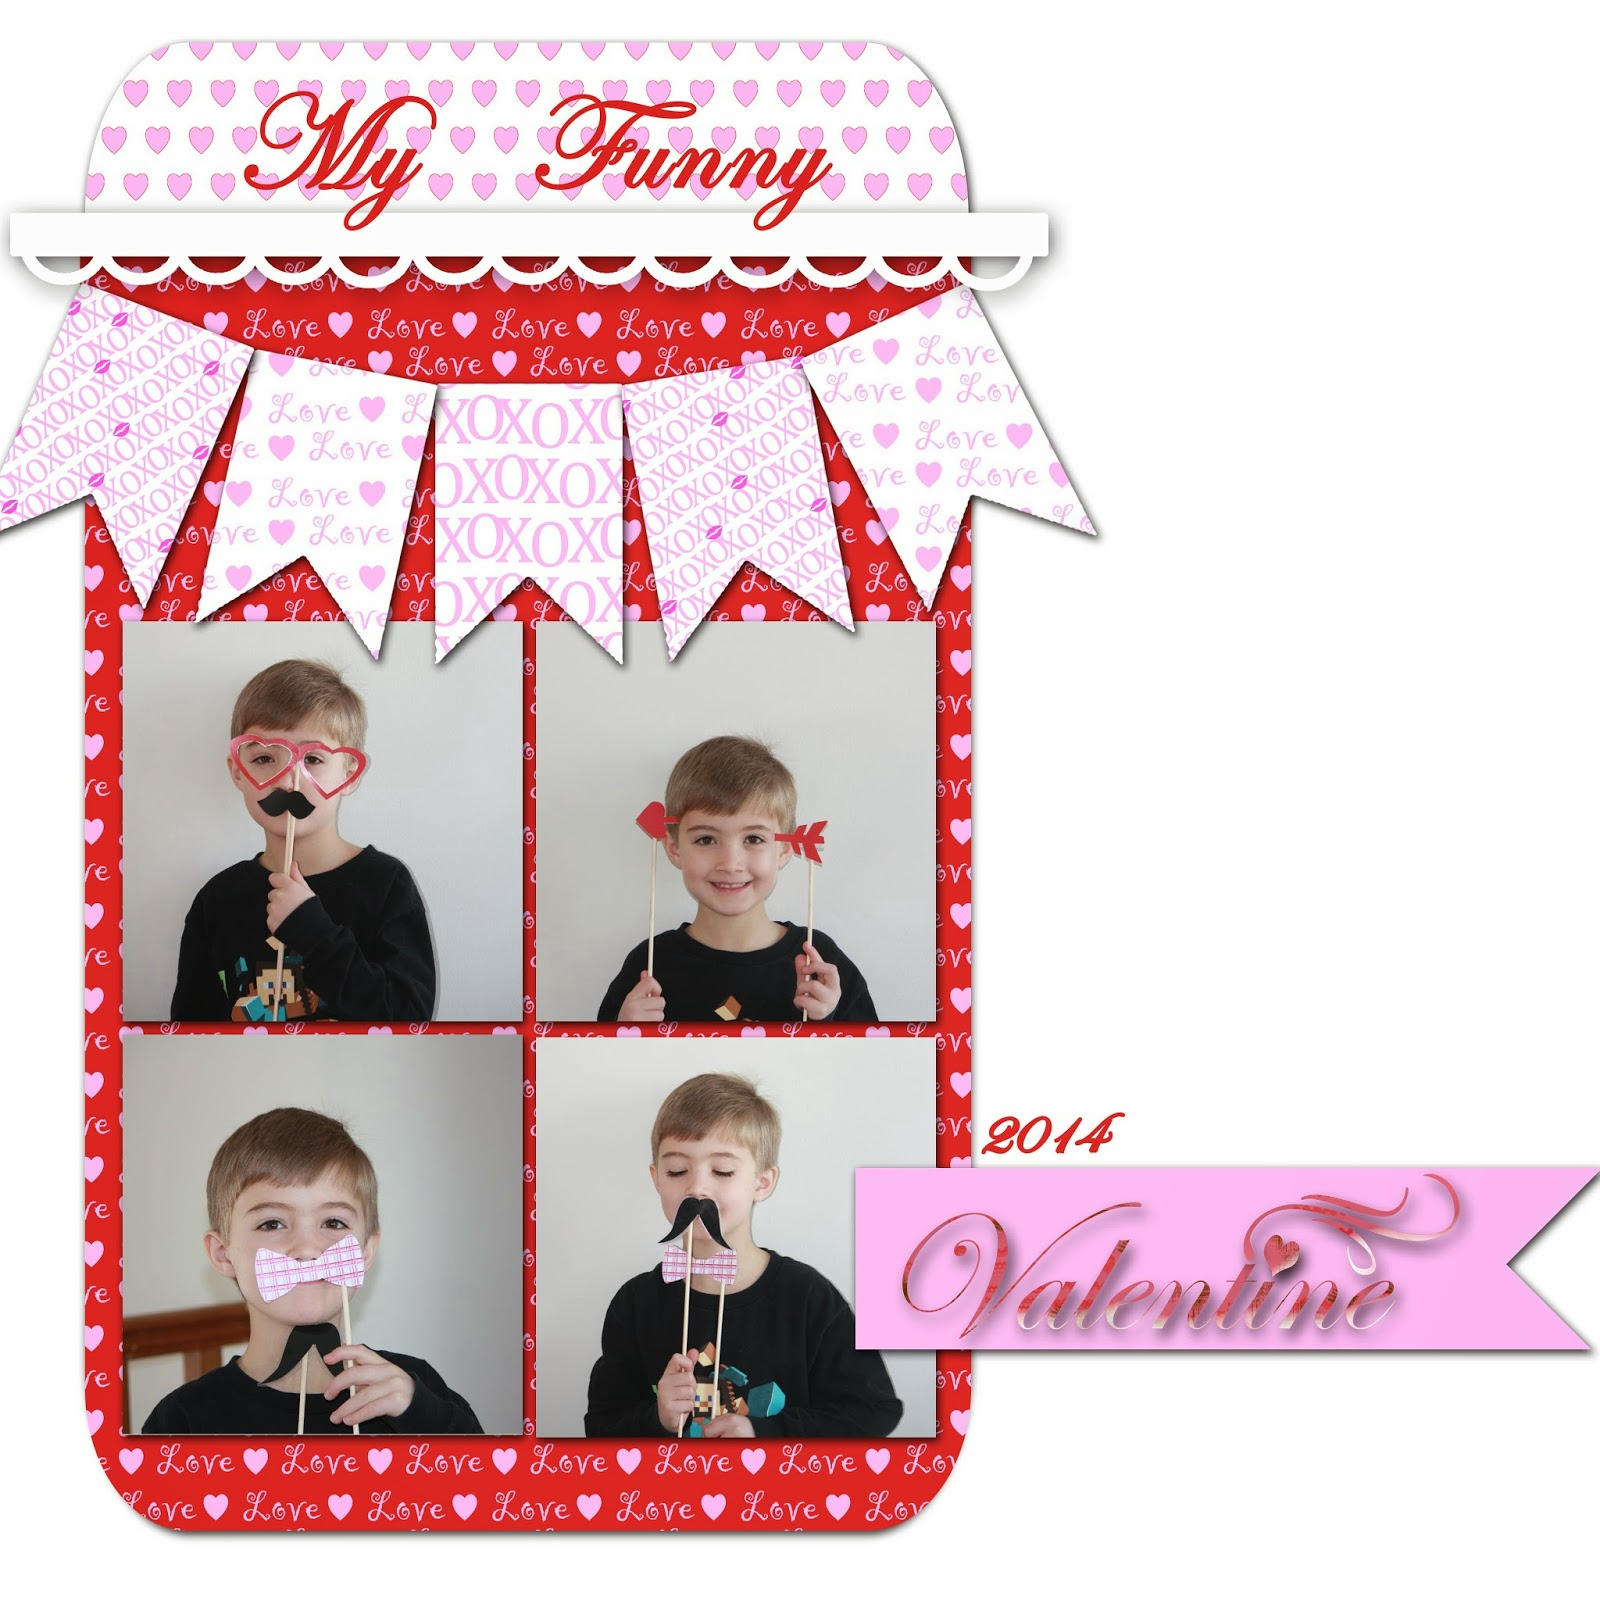 http://2.bp.blogspot.com/-GT61i6yPZlM/UwQFgBb6NDI/AAAAAAAACXI/GiAYcMJBTU0/s1600/My+Funny+Valentine.jpg